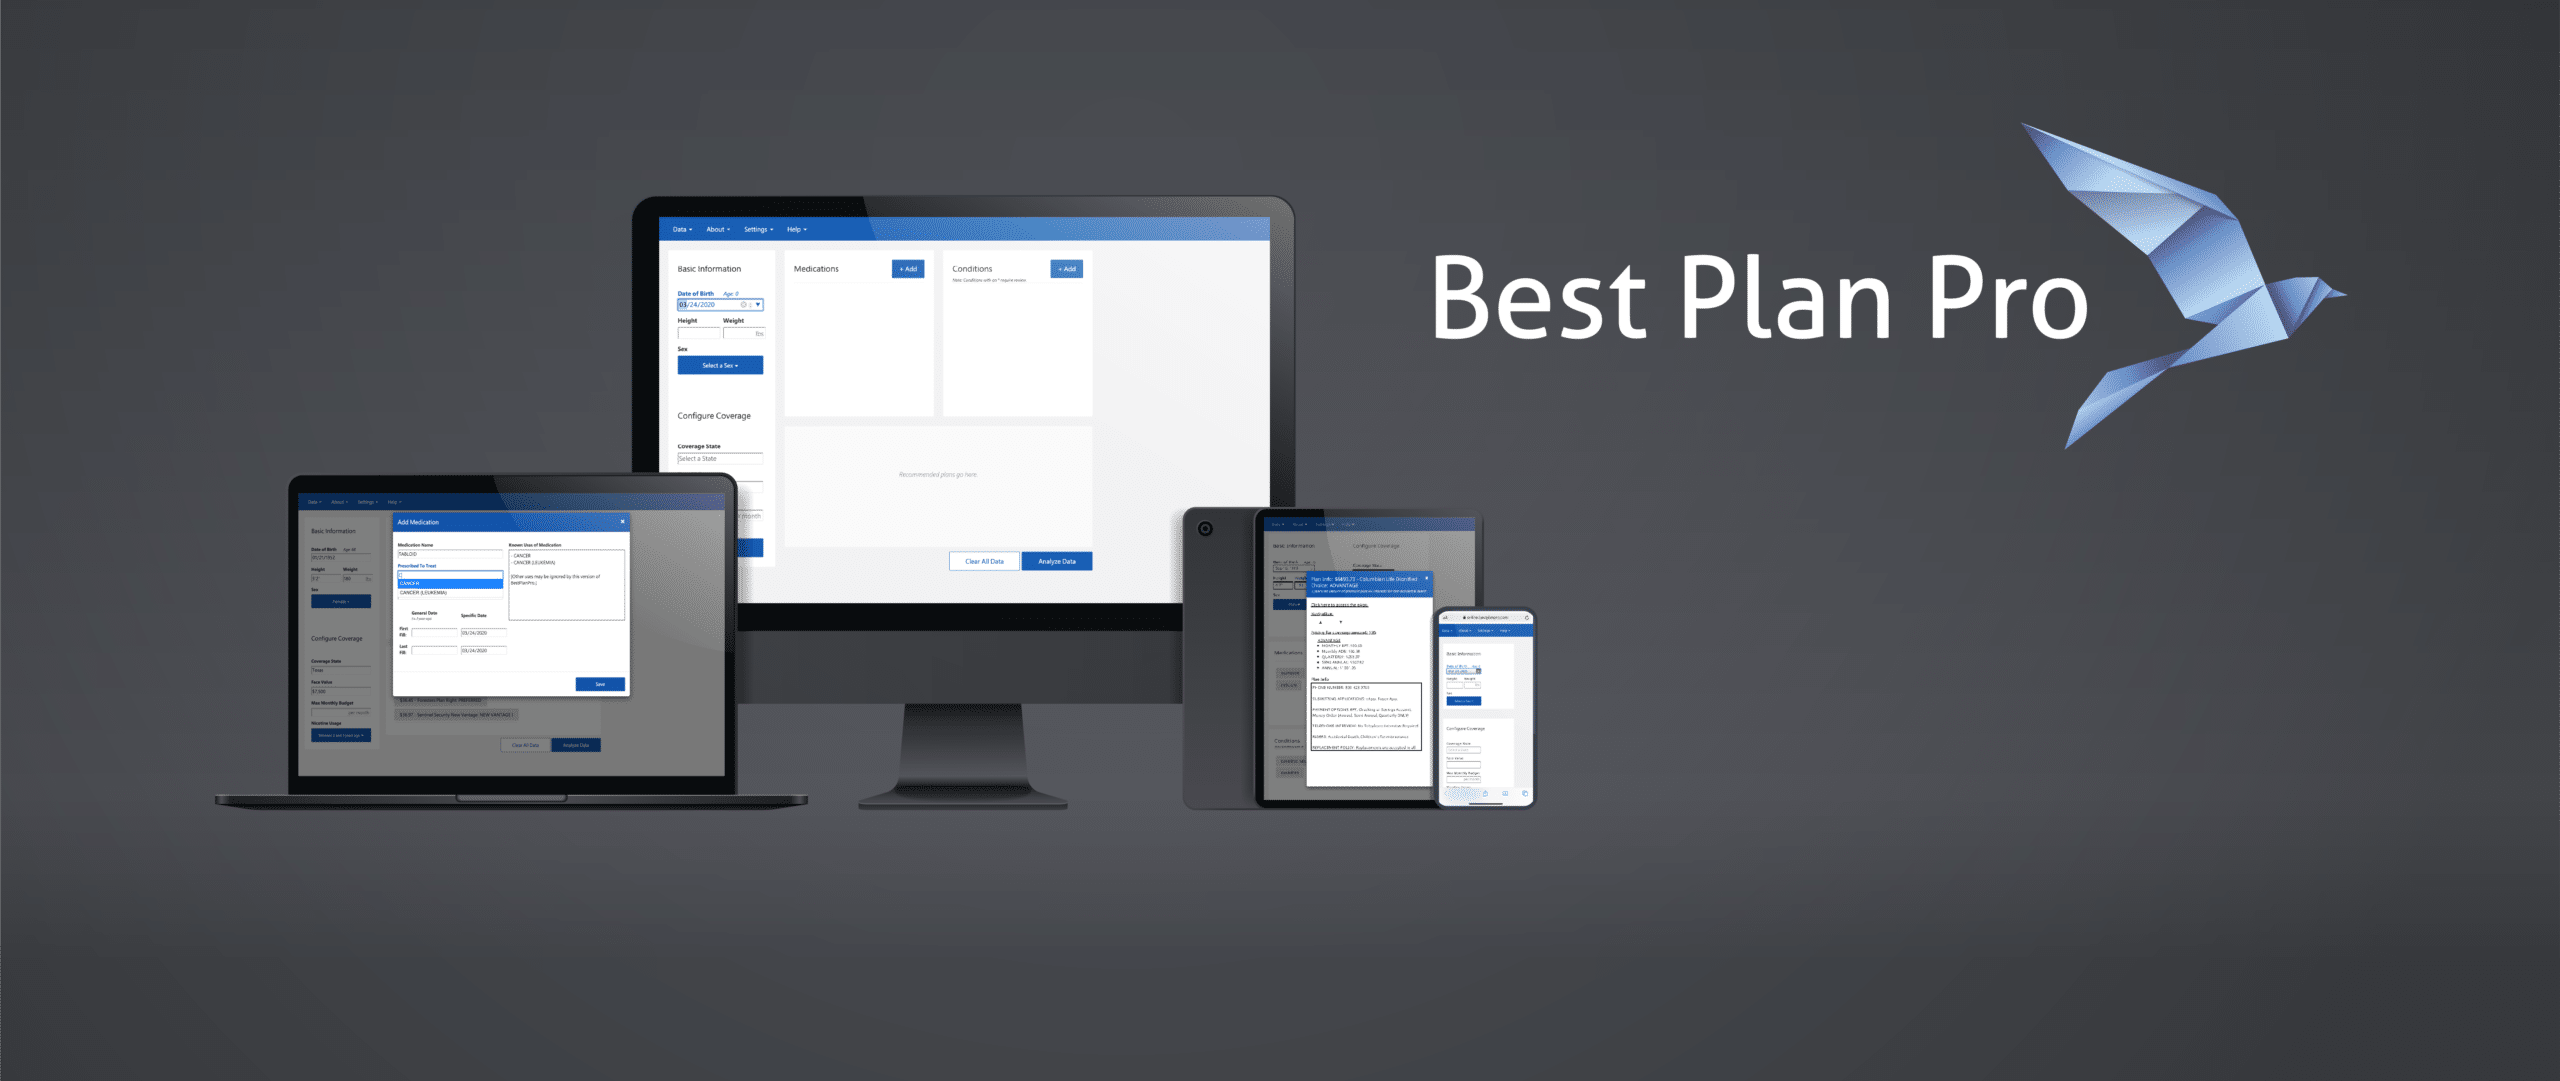 BestPlanPro Final Expense Underwriting Tool